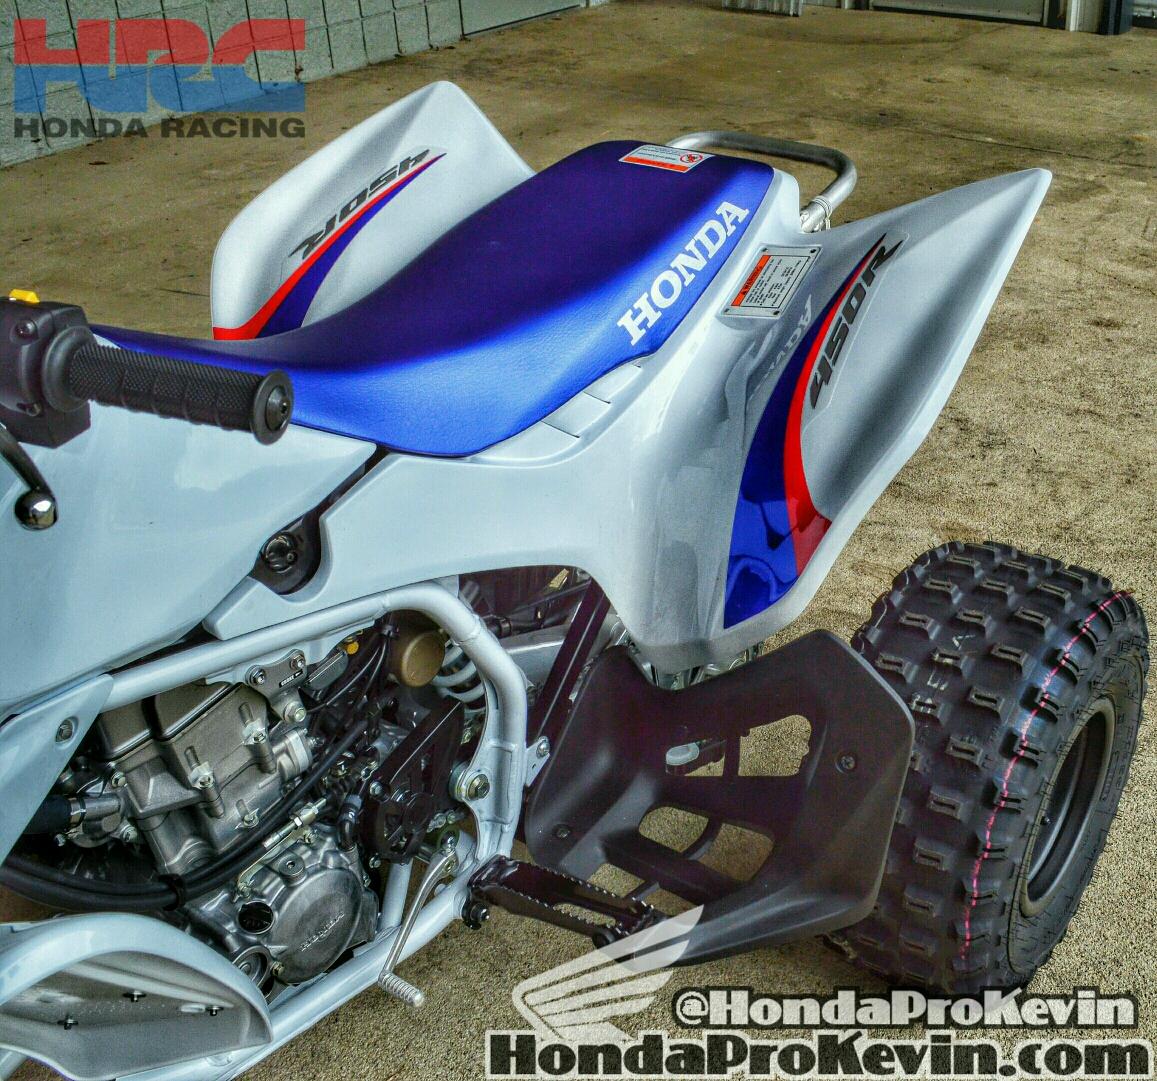 2015 Honda Trx450r >> Honda TRX450R Tri-Color Special Edition | Honda-Pro Kevin